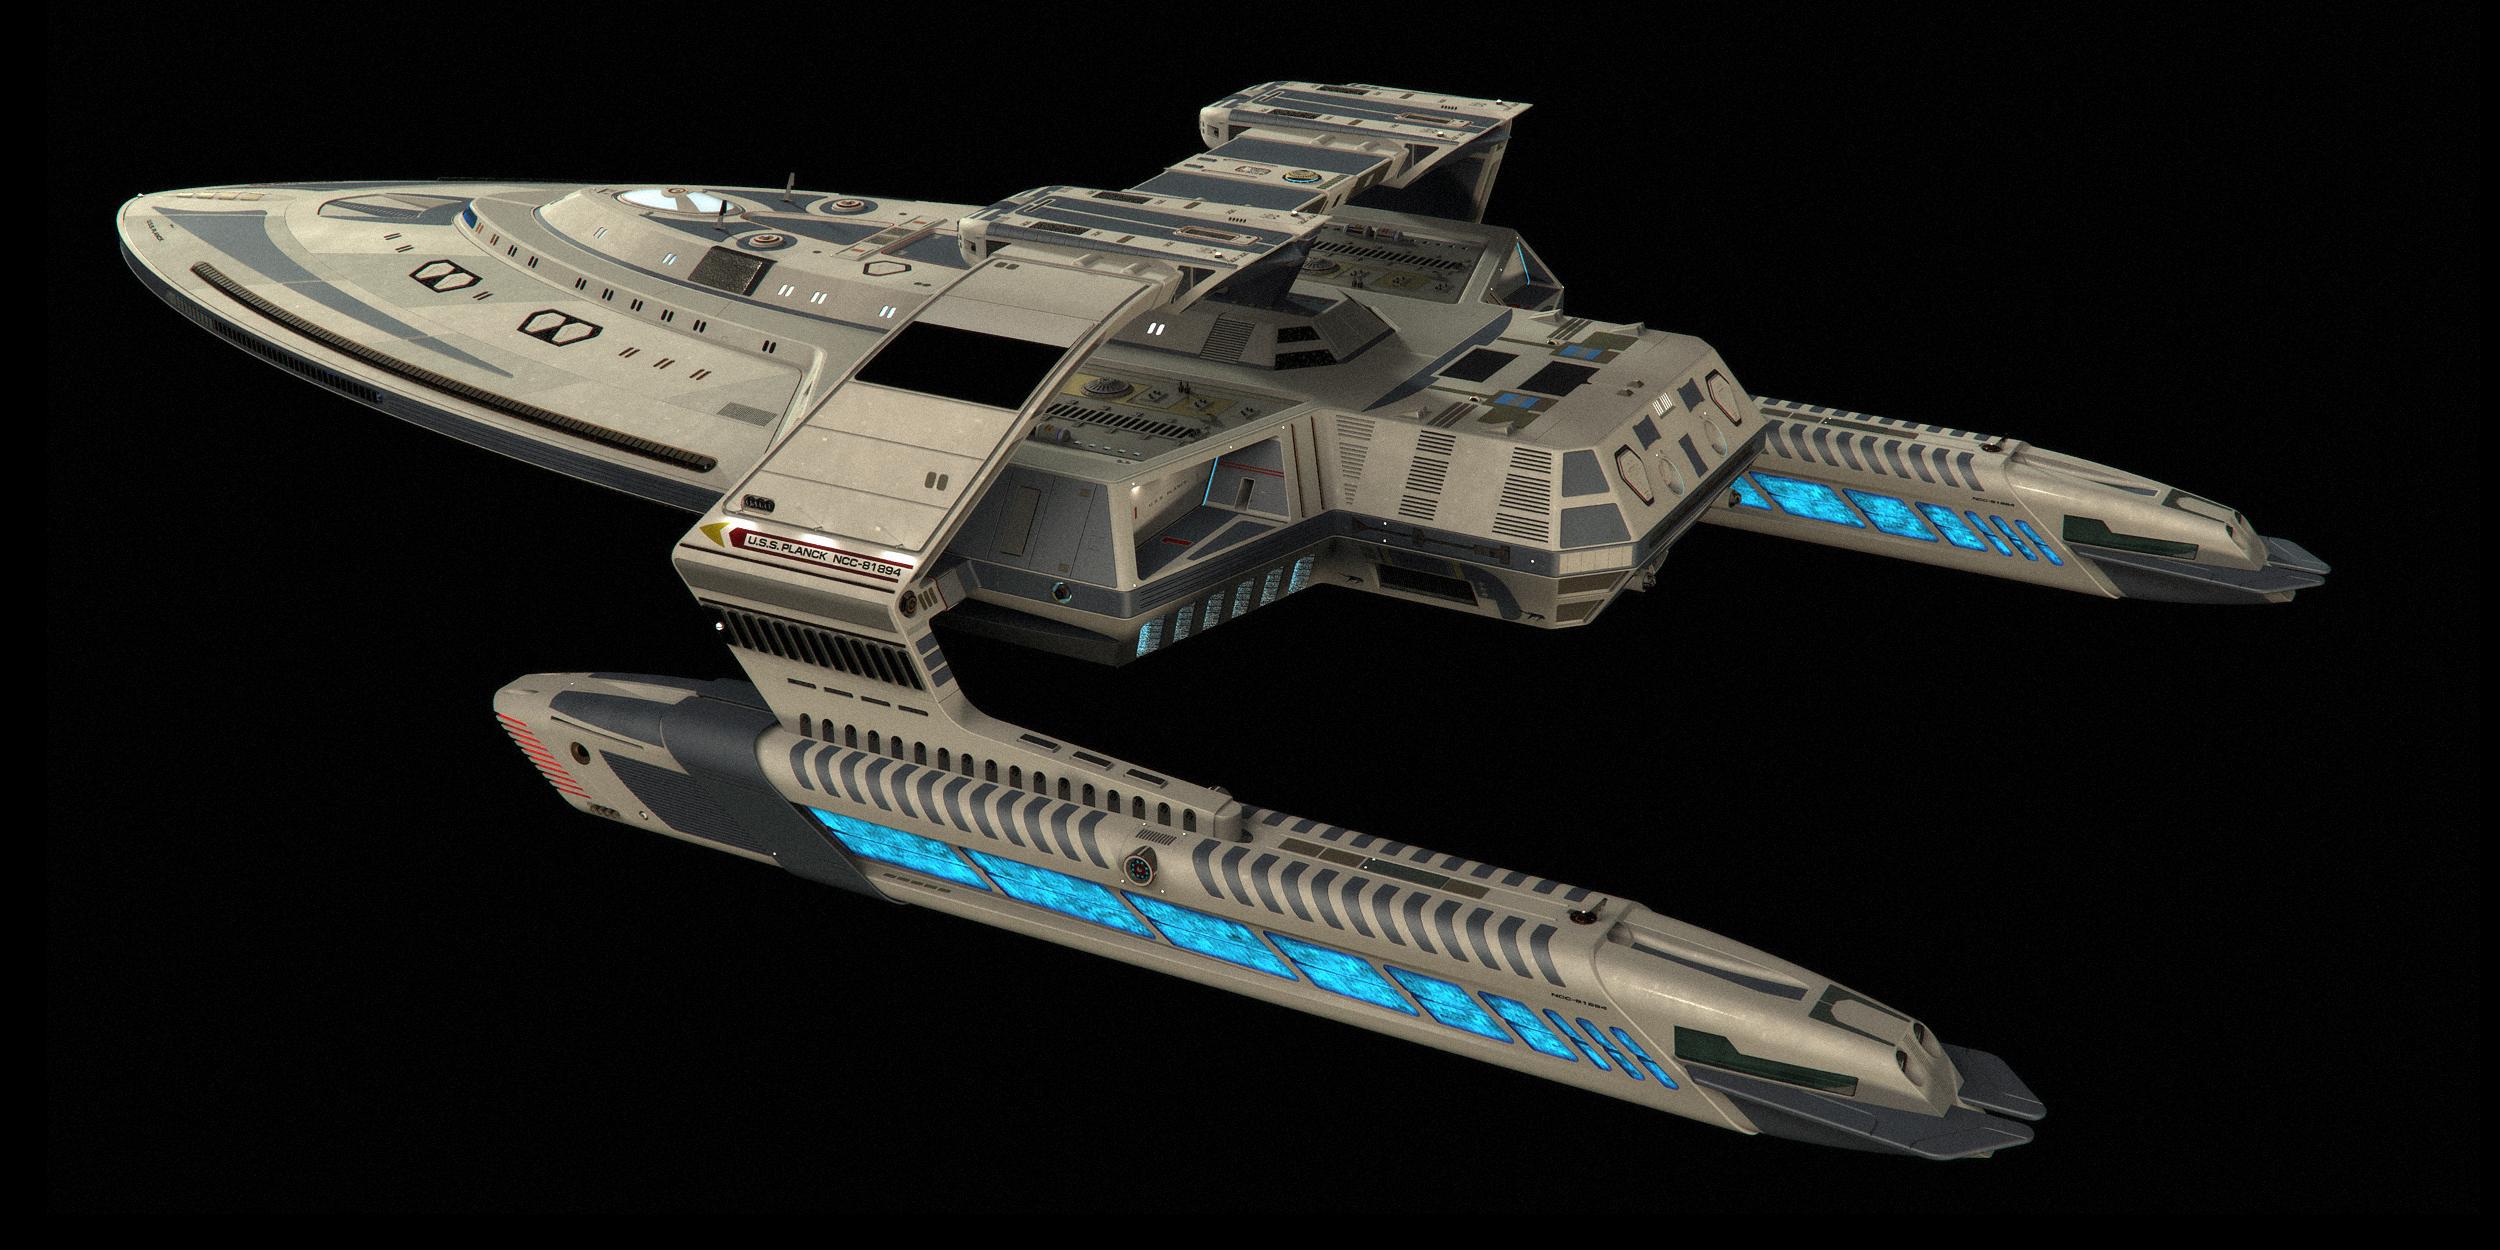 star trek future starship - photo #1